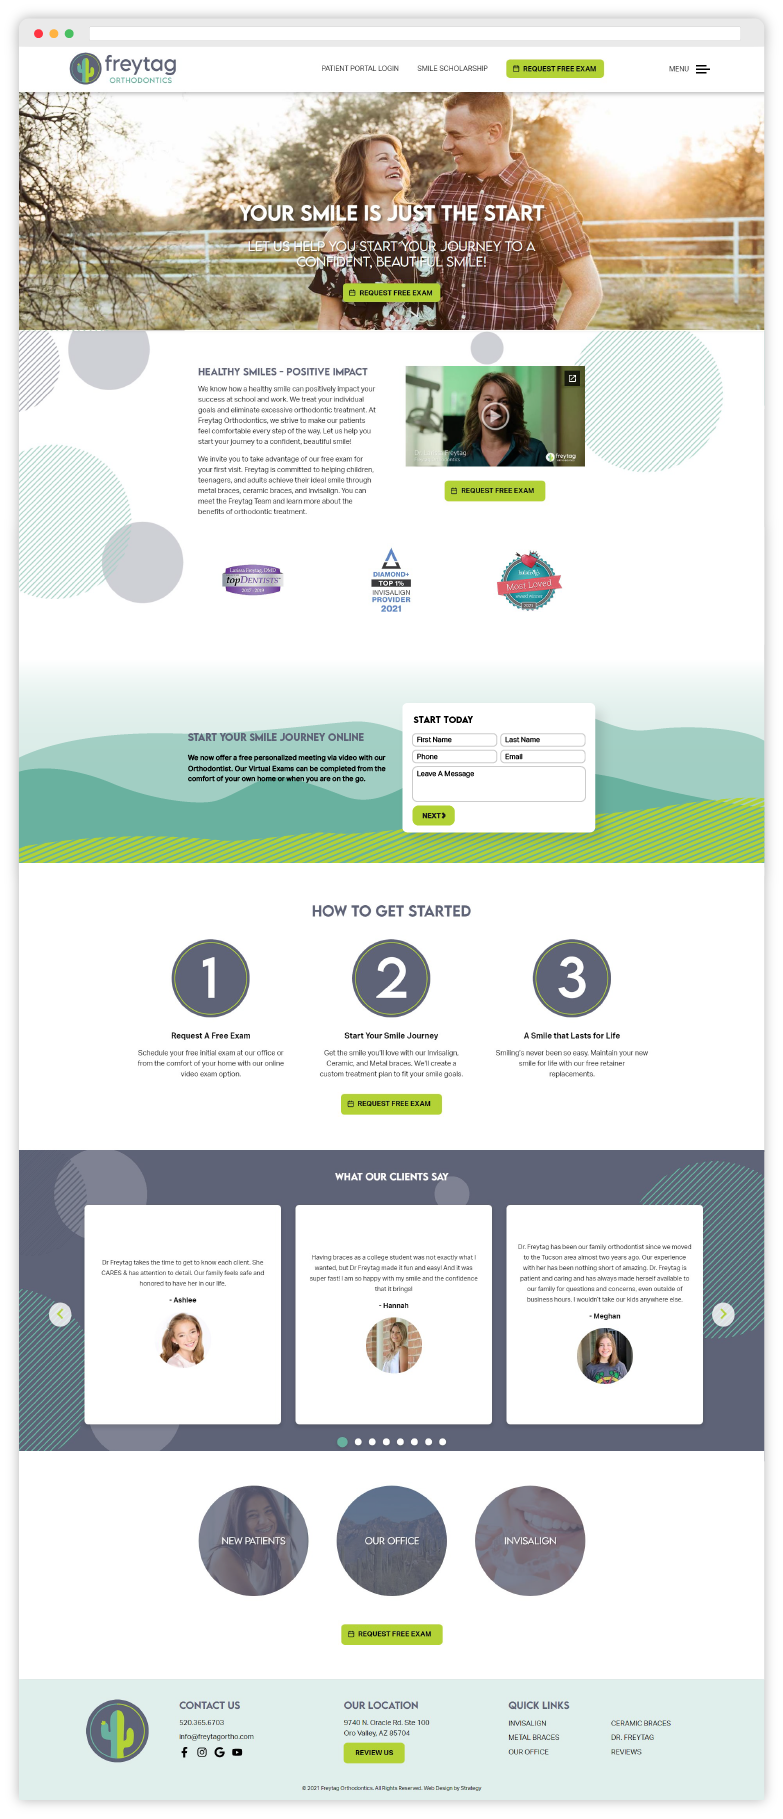 Freytag Orthodontics Website Design